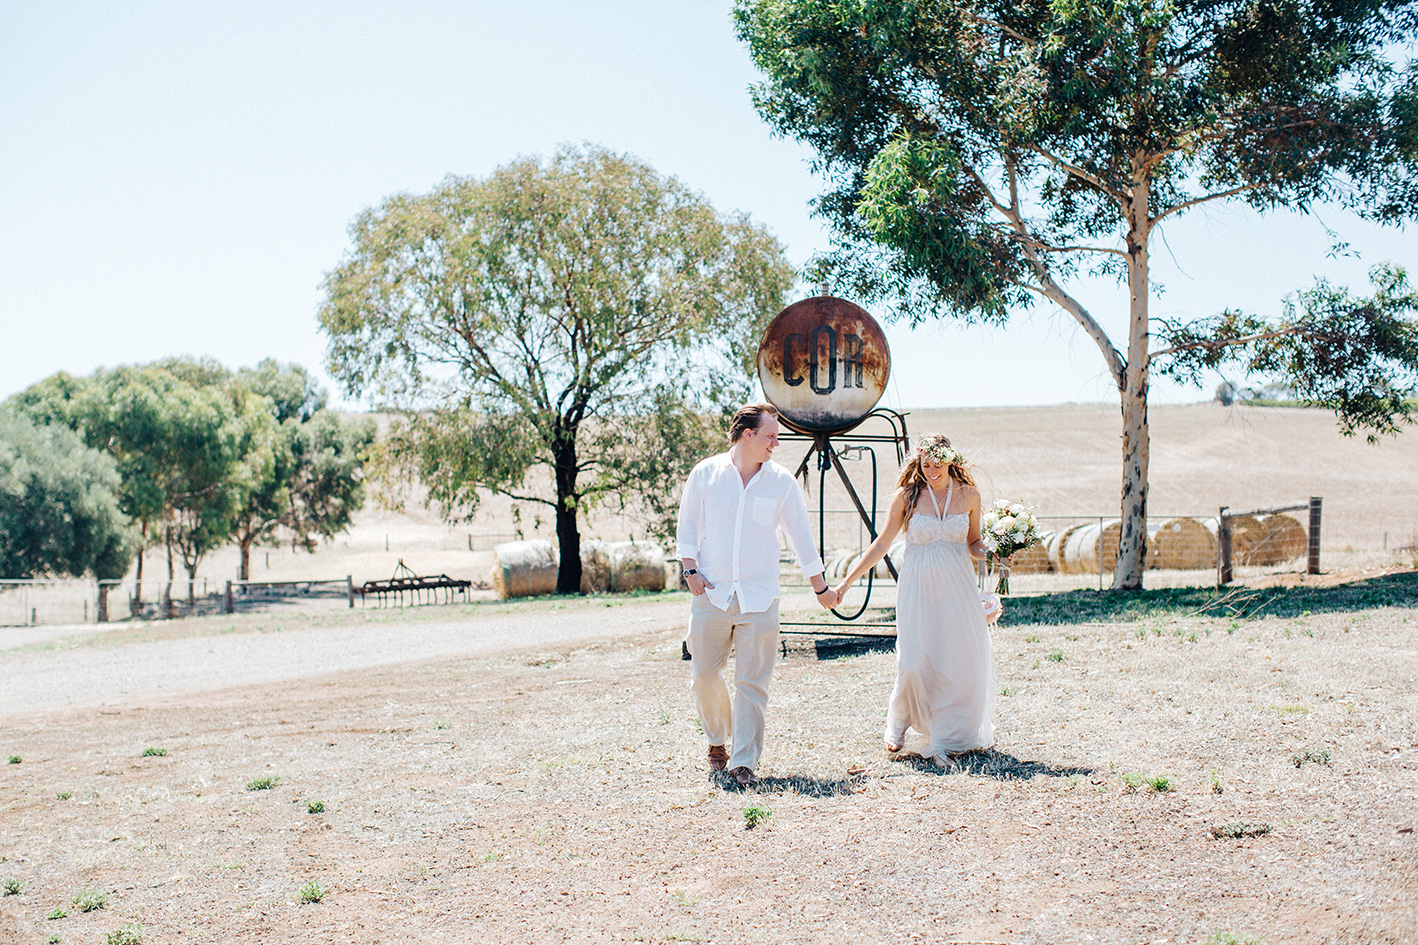 Bohemian McLaren Vale Chaff Shed Wedding 46.jpg